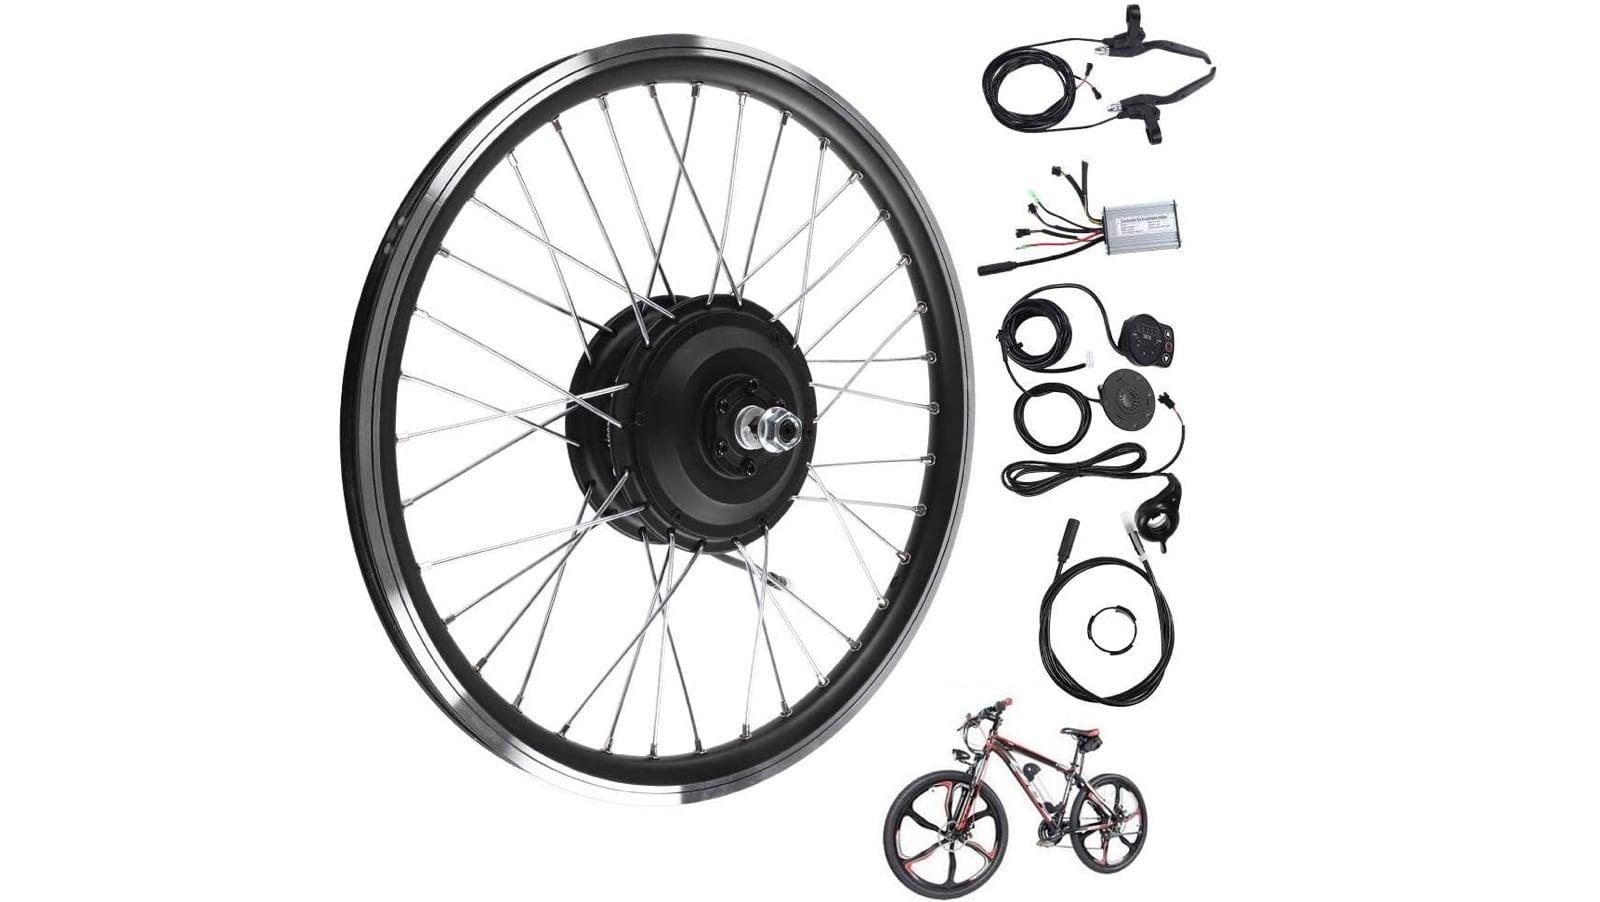 Kit de Bicicleta Eléctrica del Decathlon